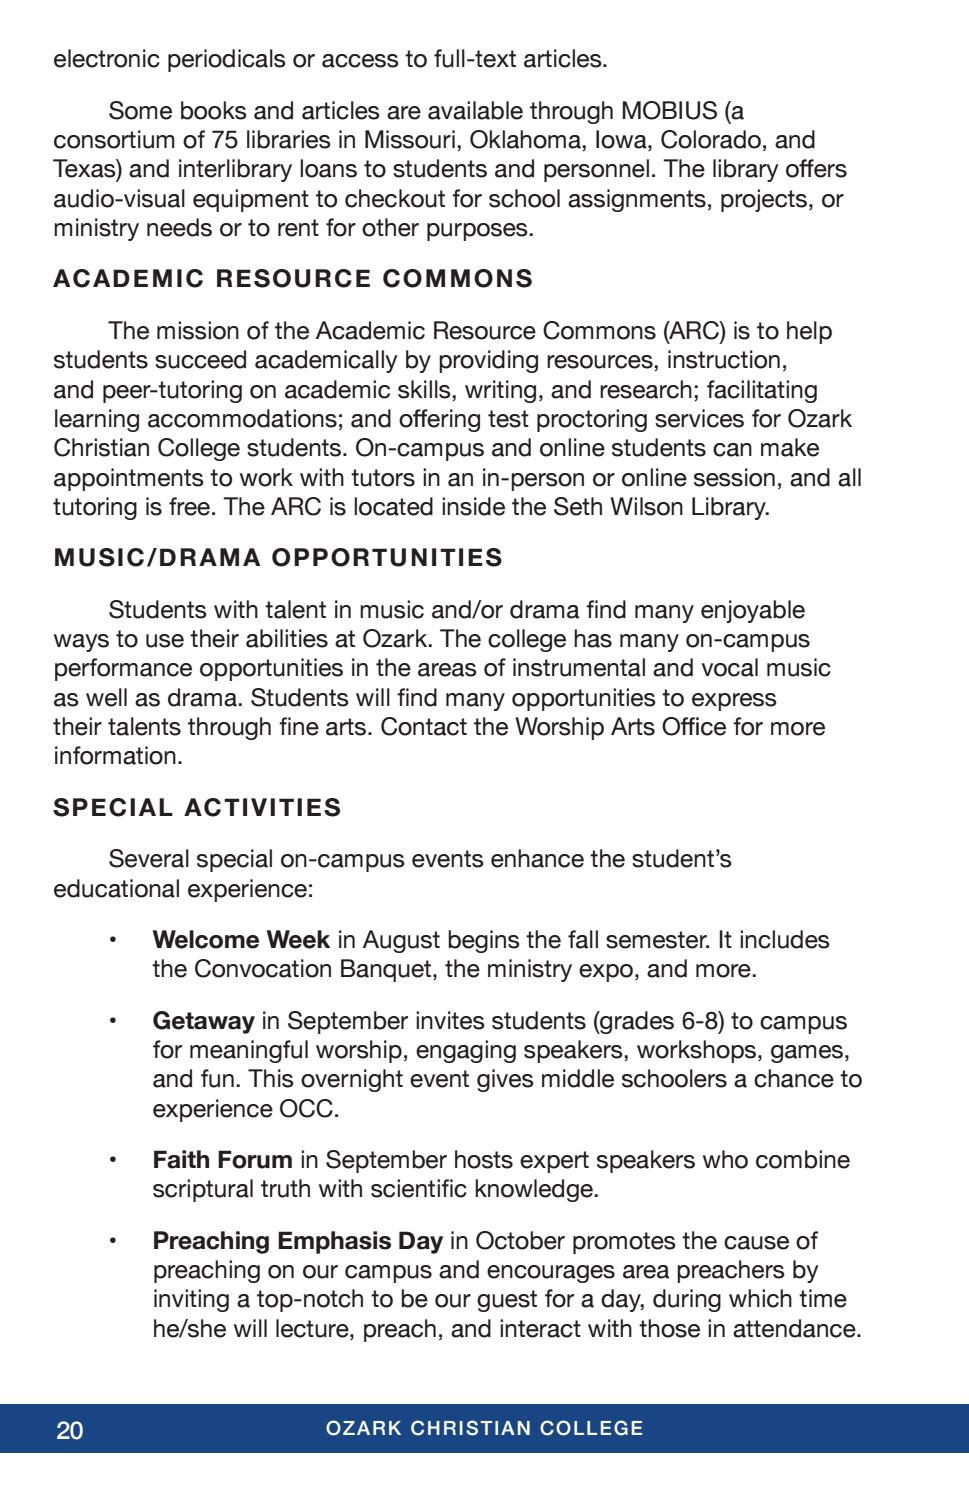 OCC 2018-19 Academic Catalog by Ozark Christian College - issuu